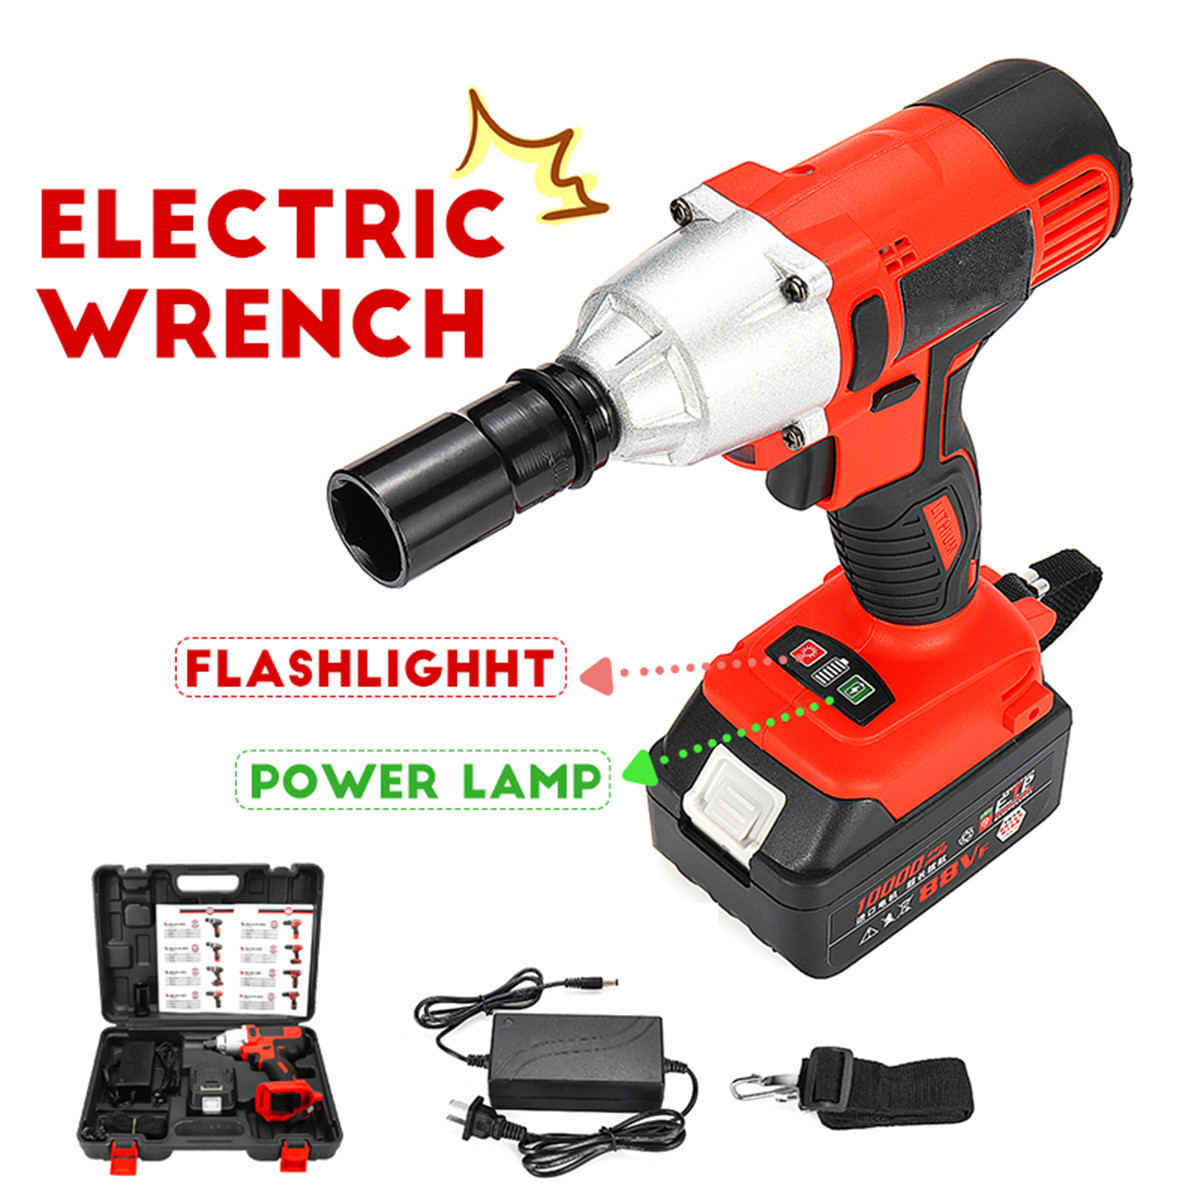 "128TV Cordless Impact Wrench 280N.M 1/2"" Socket Li-ion Battery Electric Wrench Power Tools Household Car Wheel Car Repair Tool"